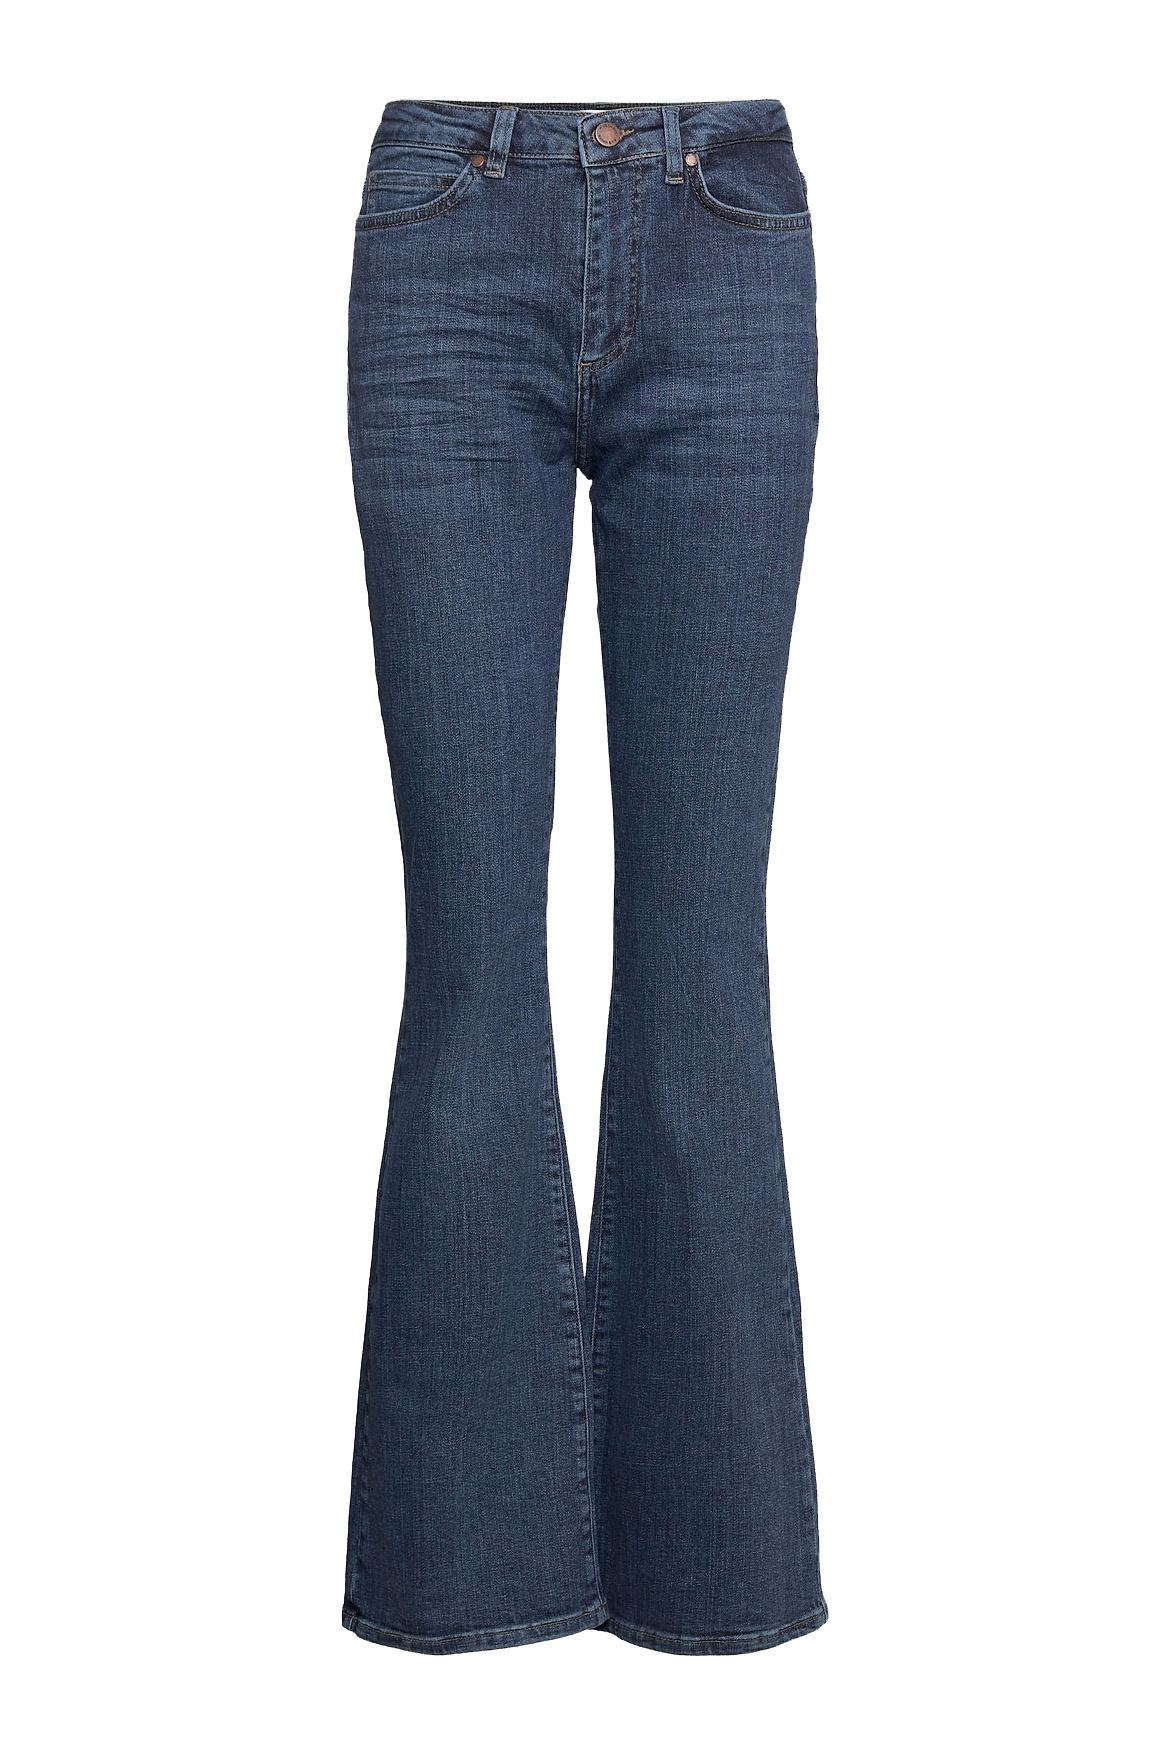 Naomi Jeans - Illusion Blue Auto-1